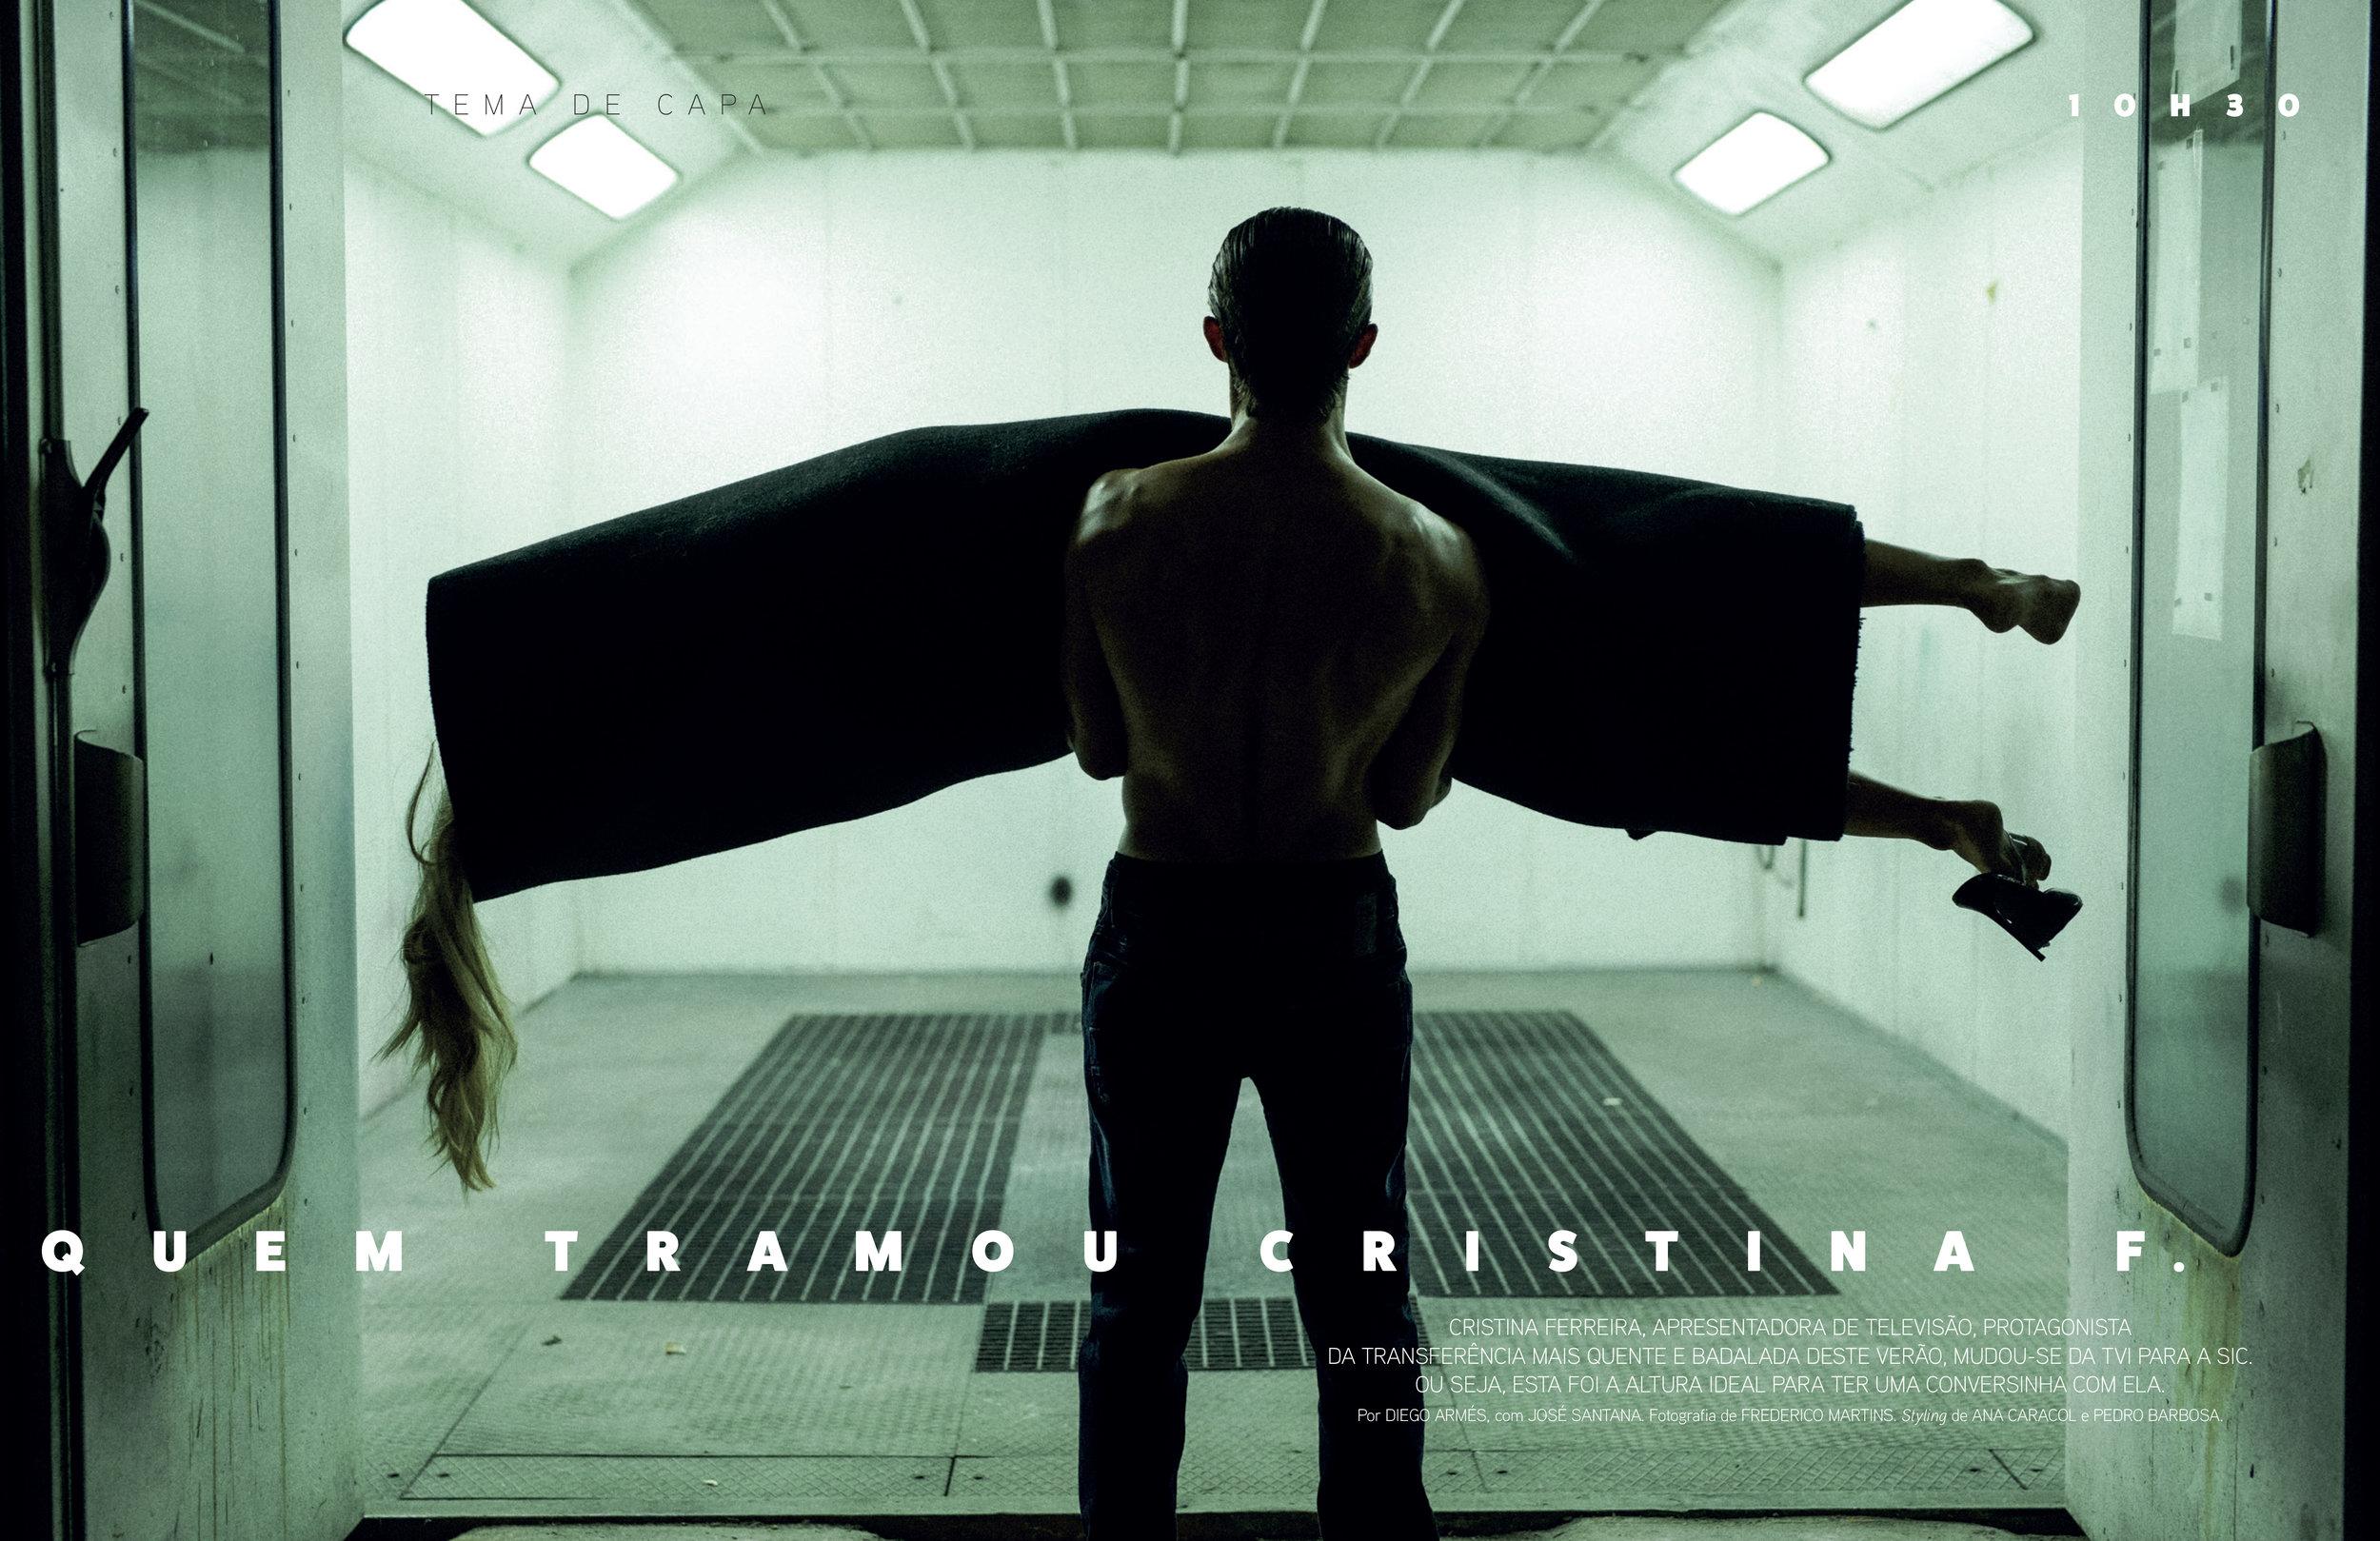 Cristina Ferreira-1.jpg